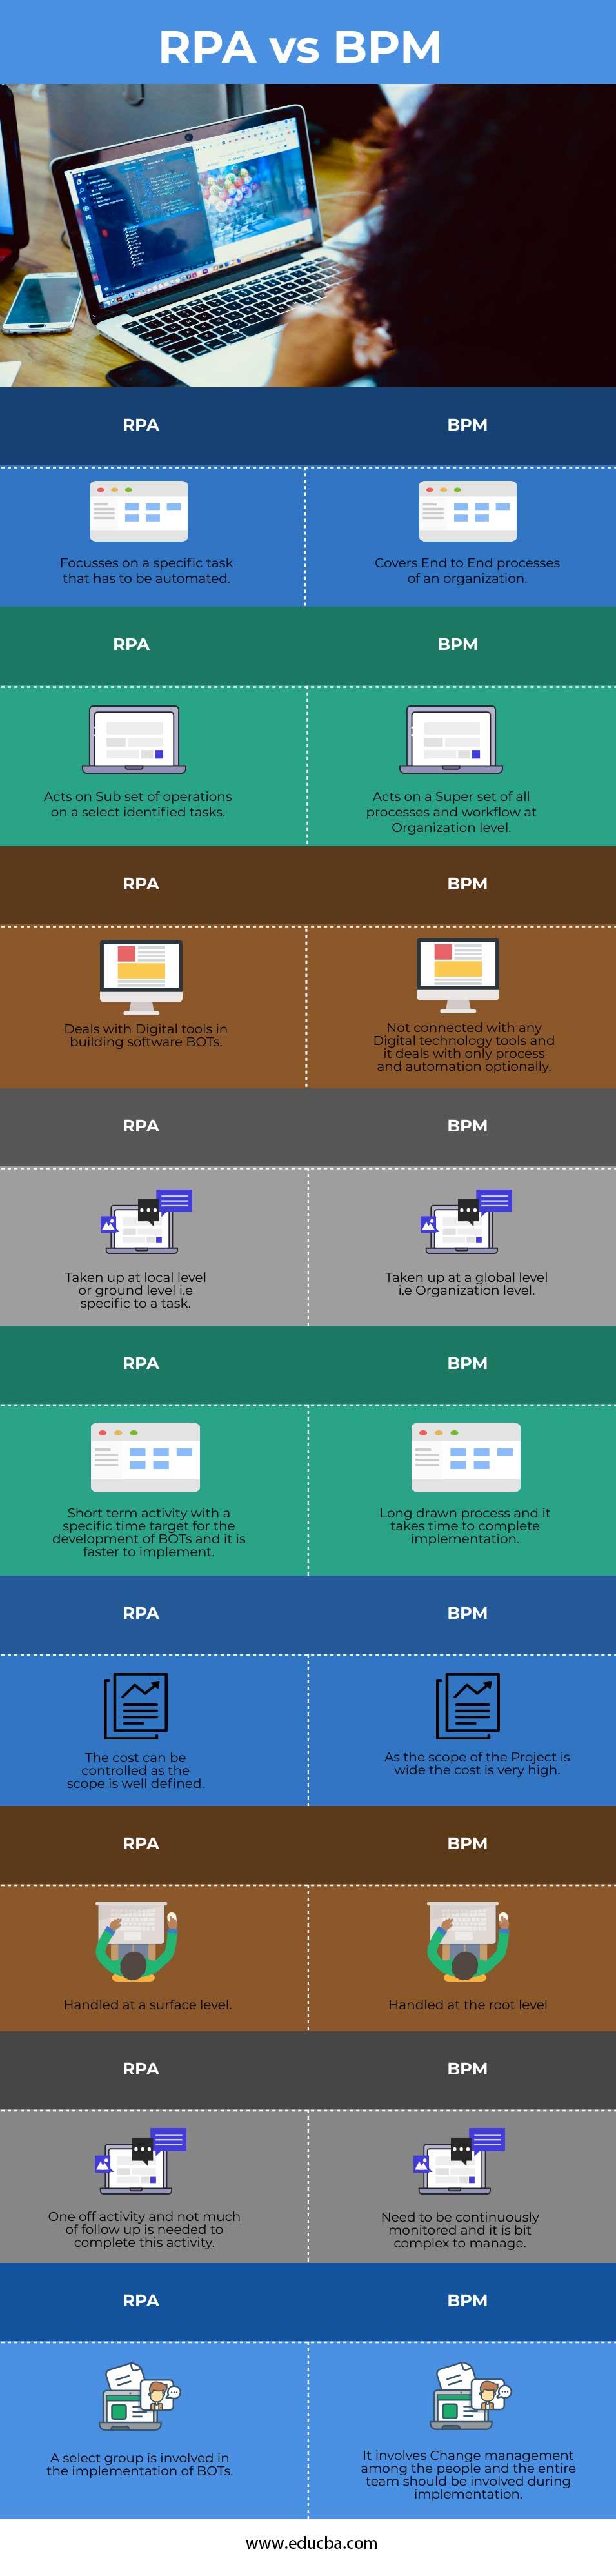 RPA vs BPM Info